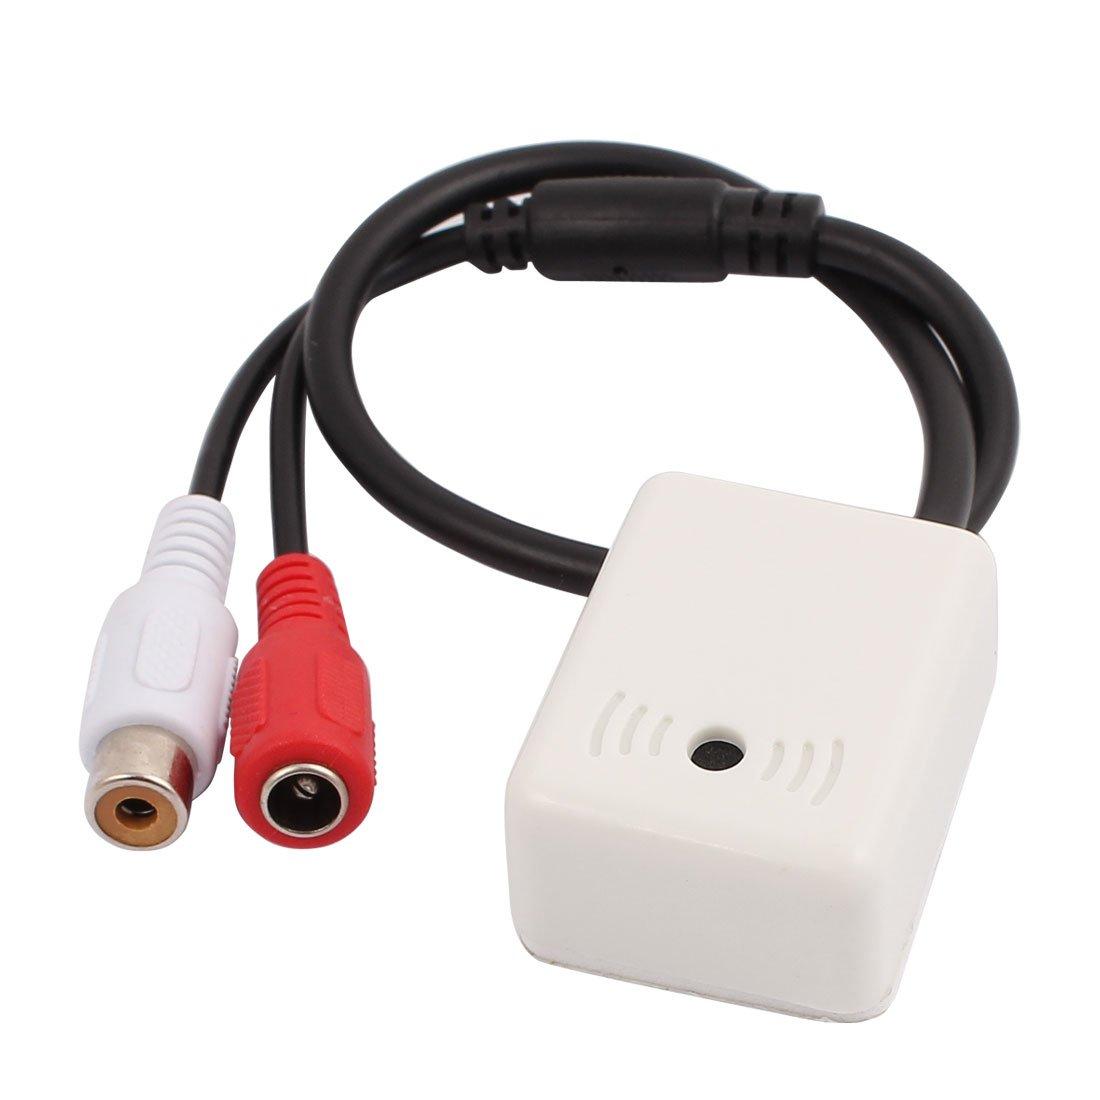 uxcell 1Pcs DC12V NVL-502C Microphone Audio Recording Security Sound Pick Up